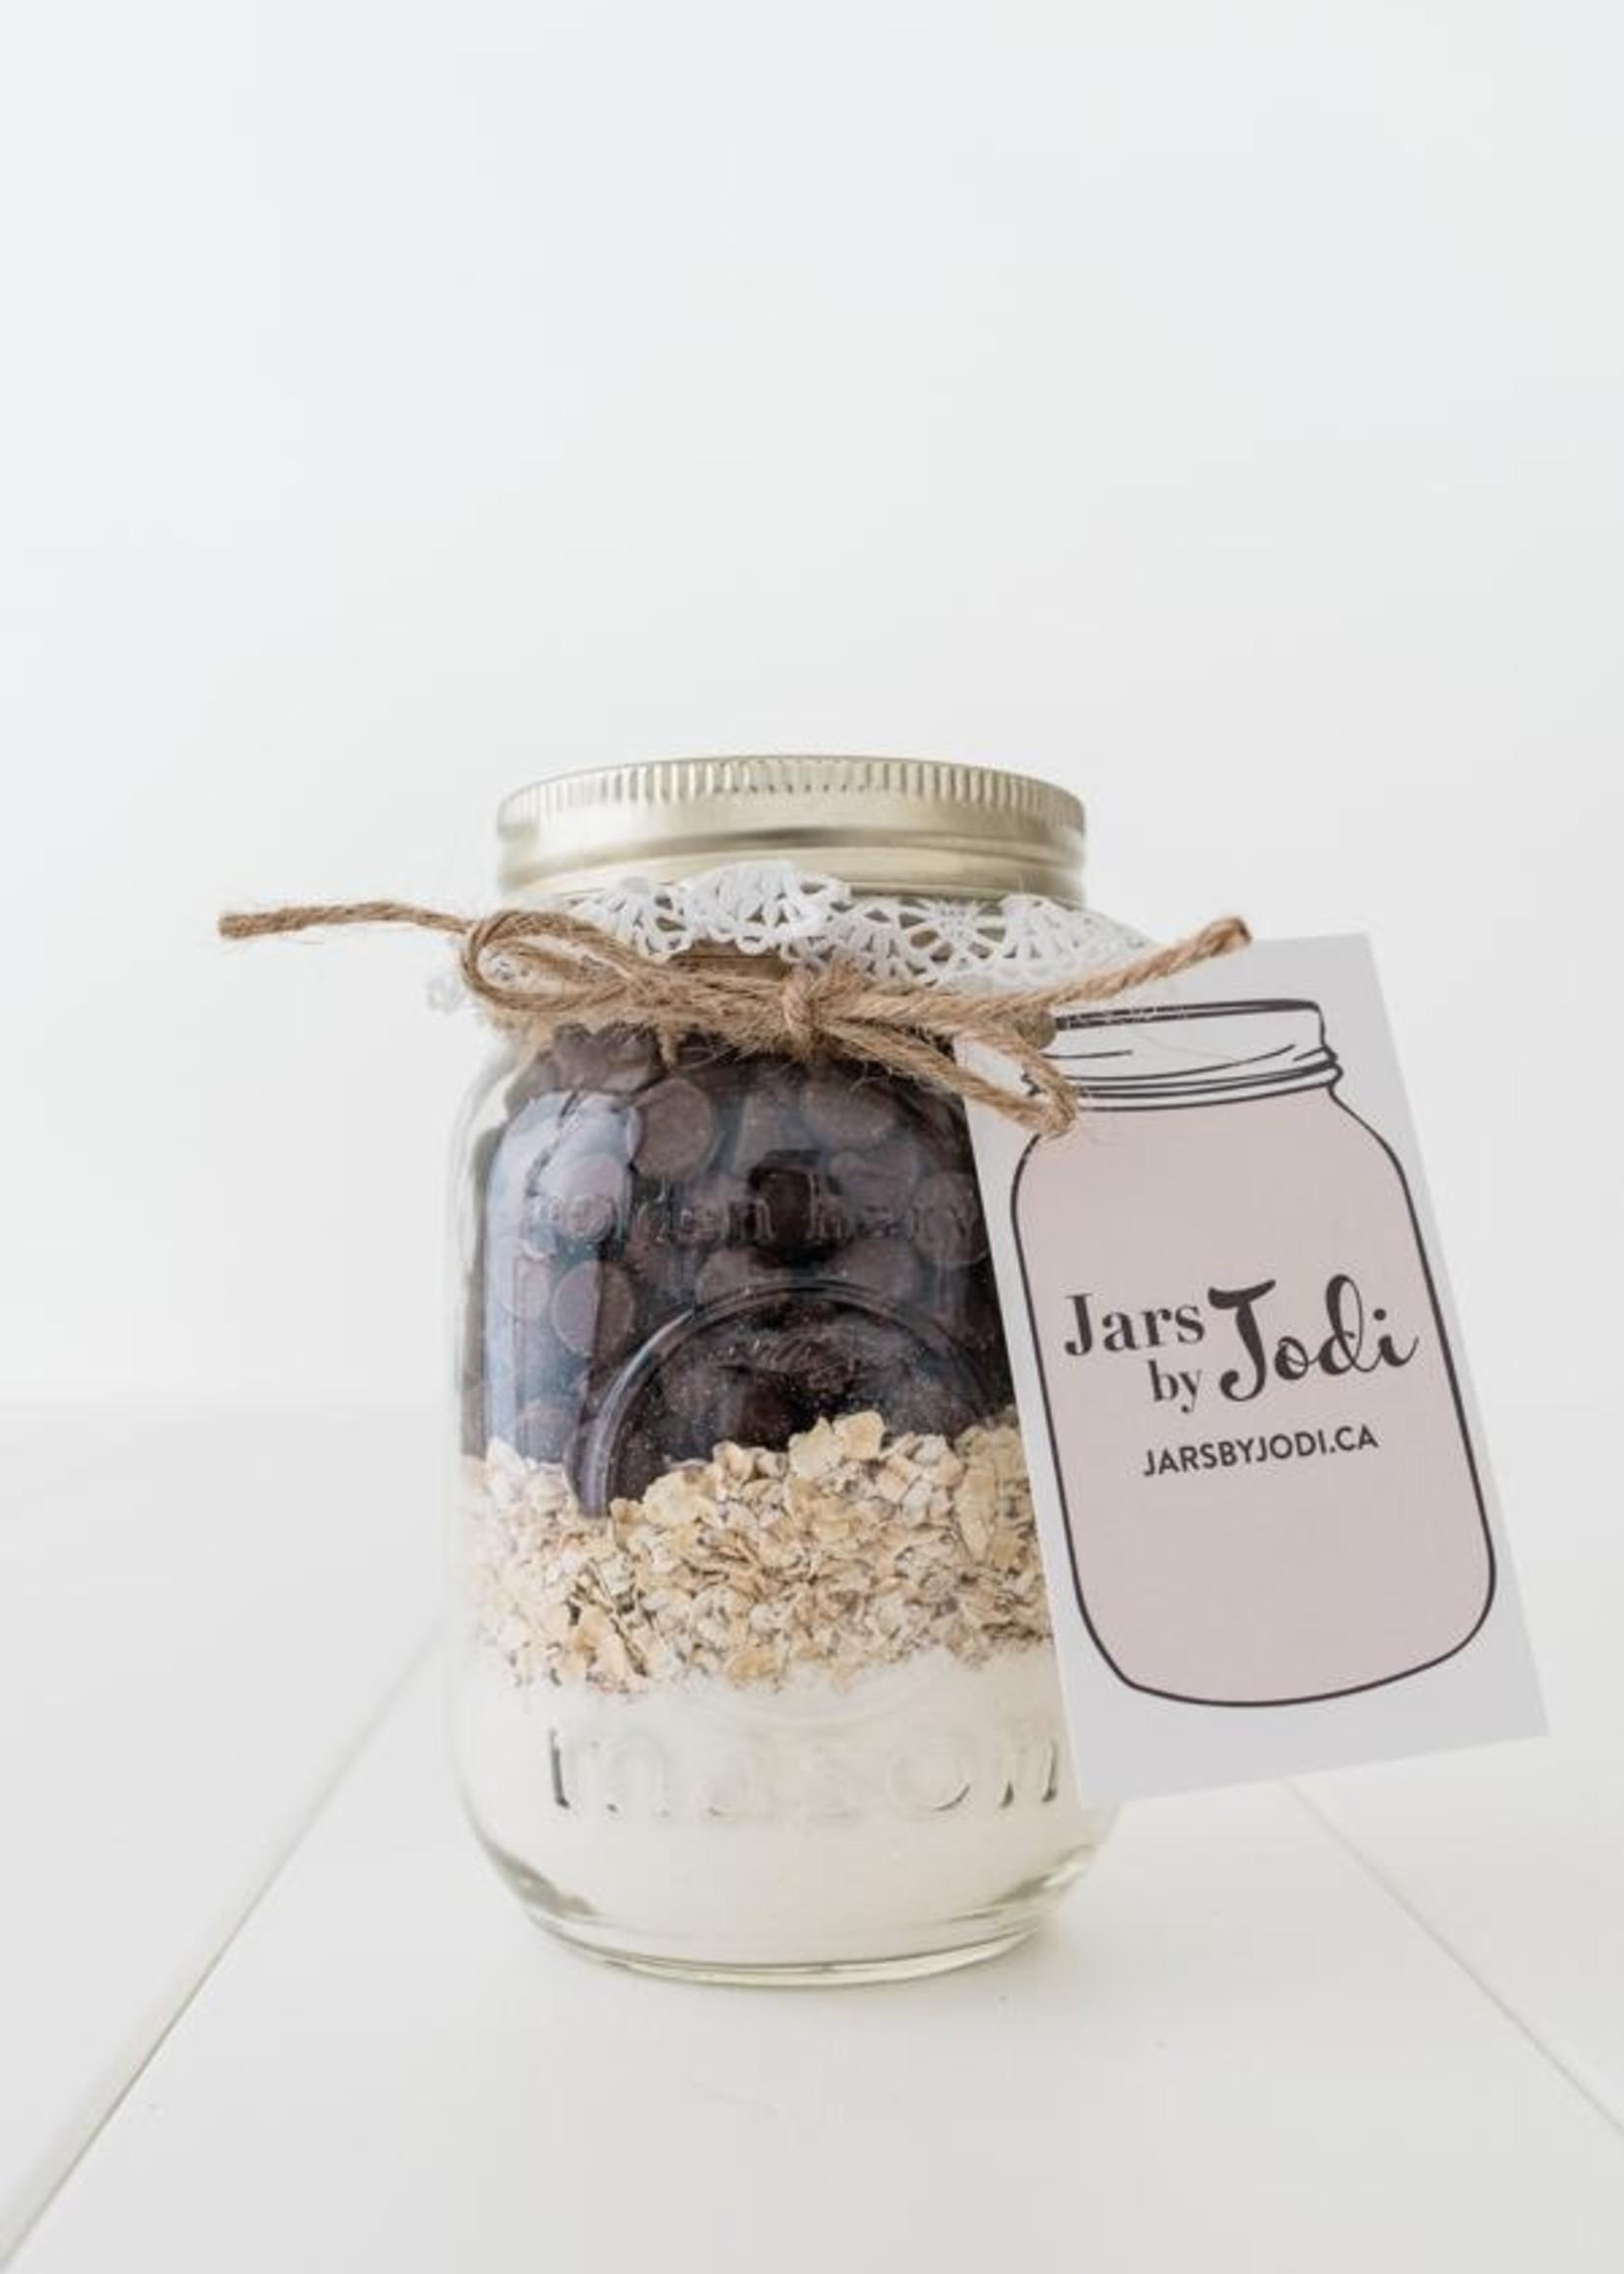 Jars By Jodi Oatmeal Chocolate Chip Cookies | Mini